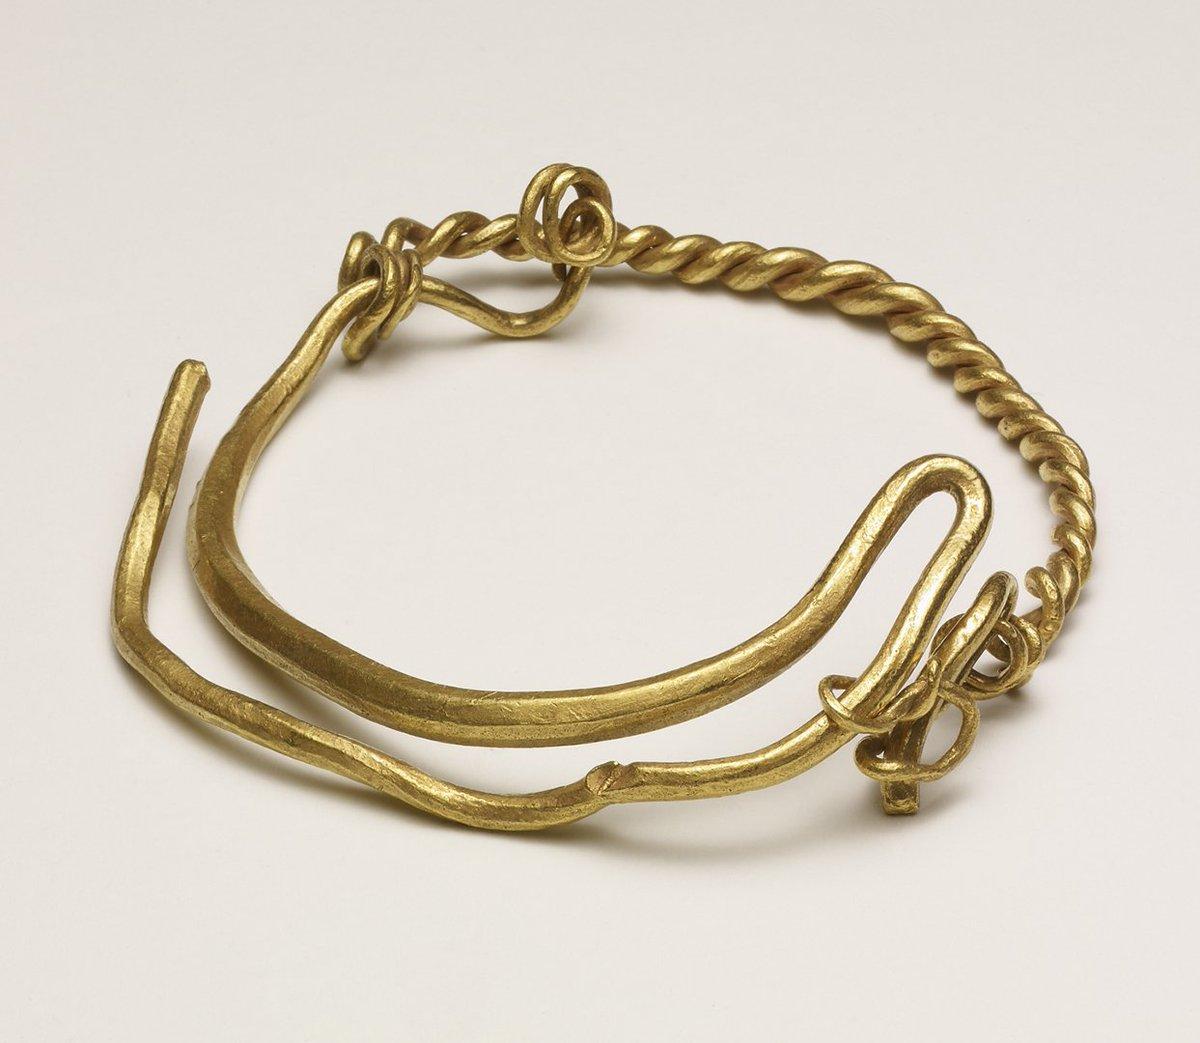 British Museum On Twitter Viking Arm Rings Were Presented As